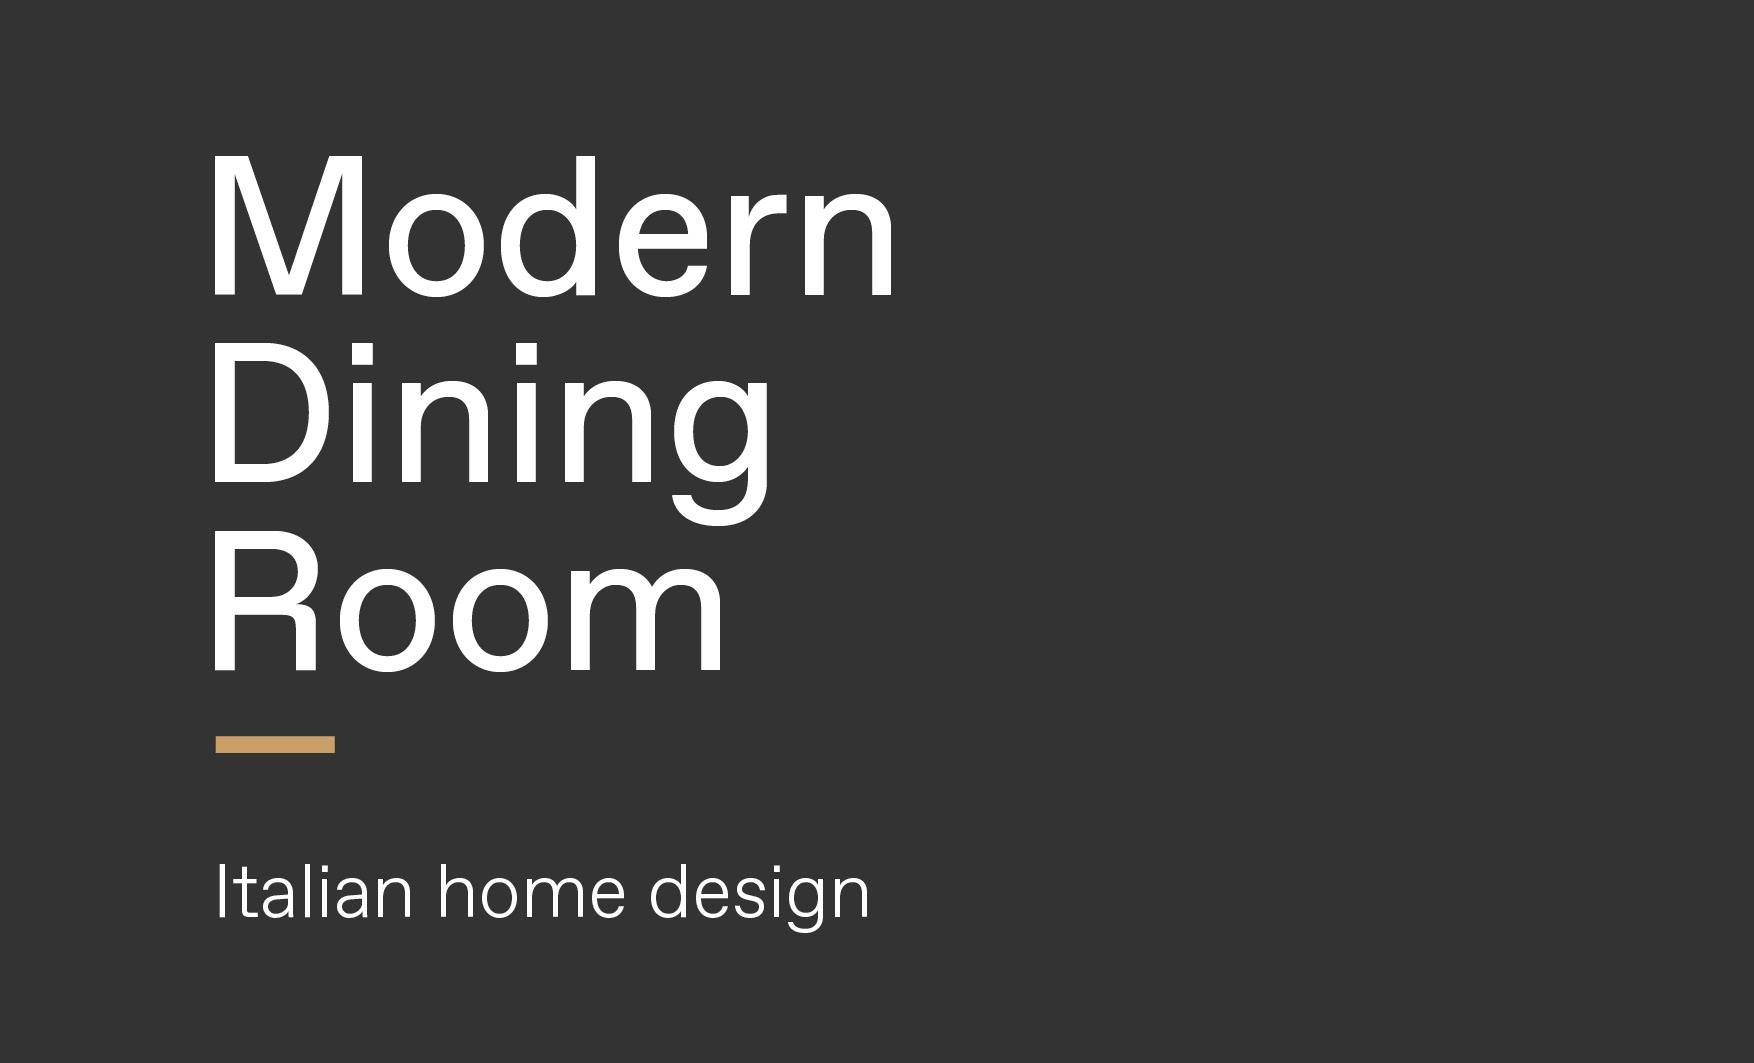 Concept of modern Italian dining room design made by Esperiri team